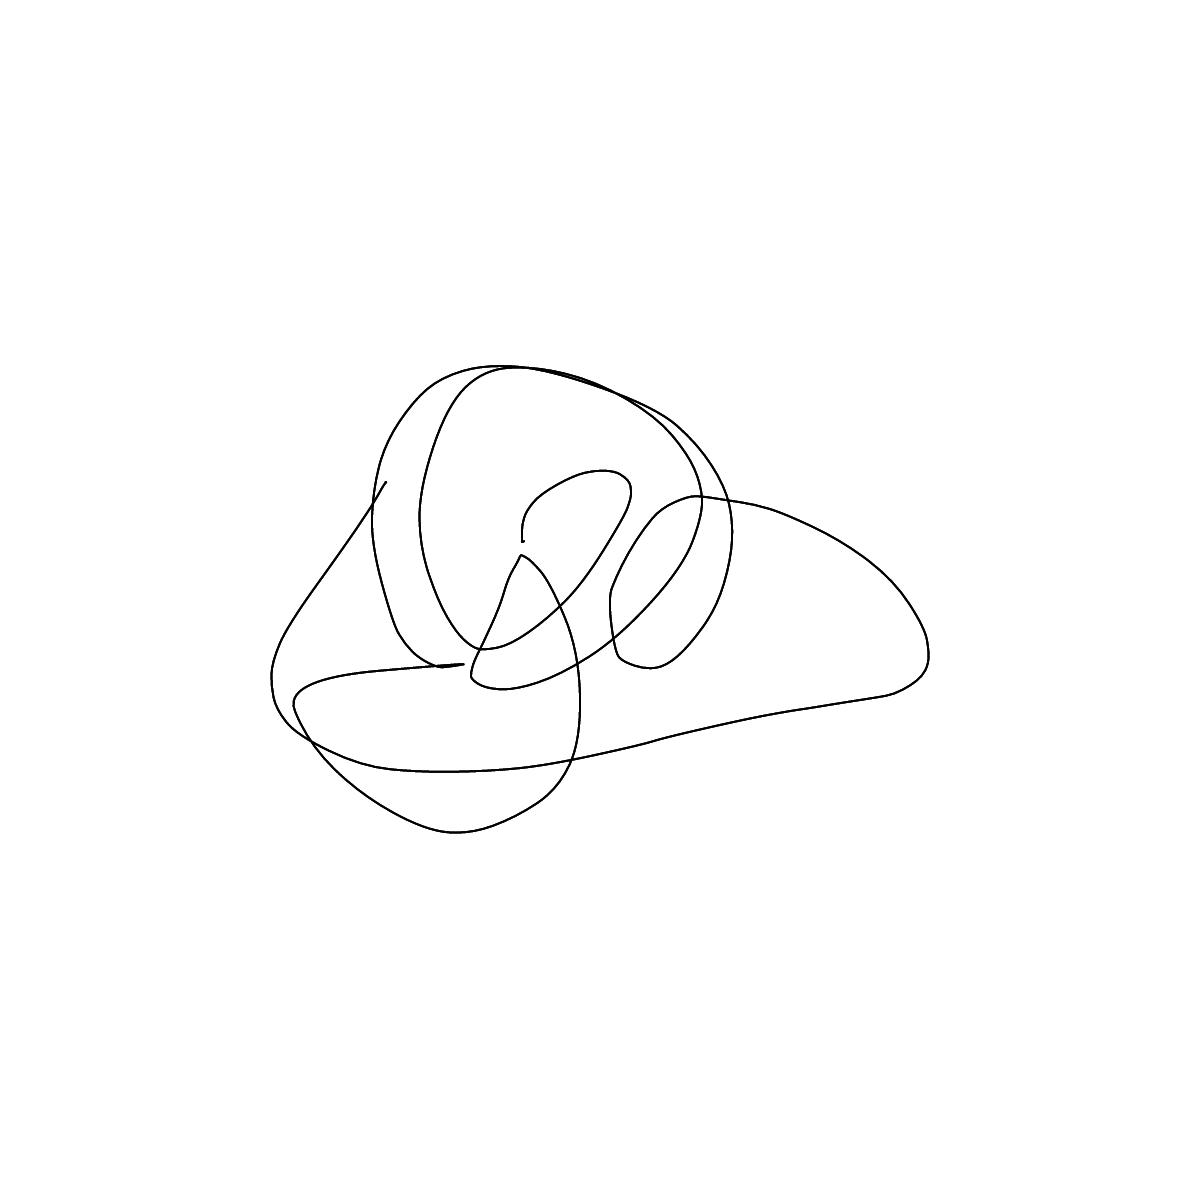 BAAAM drawing#469 lat:51.5248451232910160lng: -0.0667672678828239